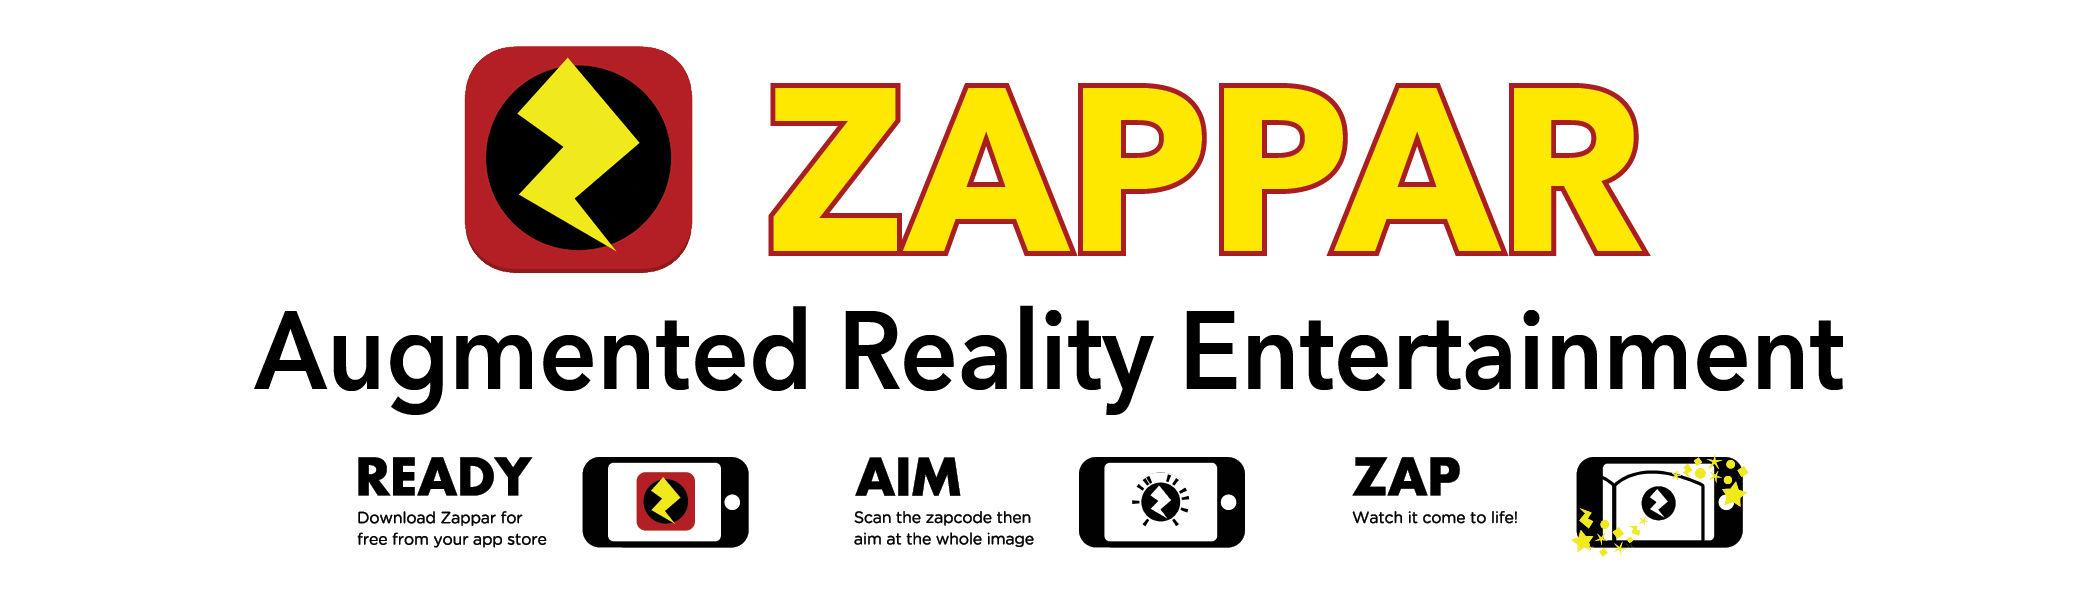 Zappar Augmented Reality Entertainment